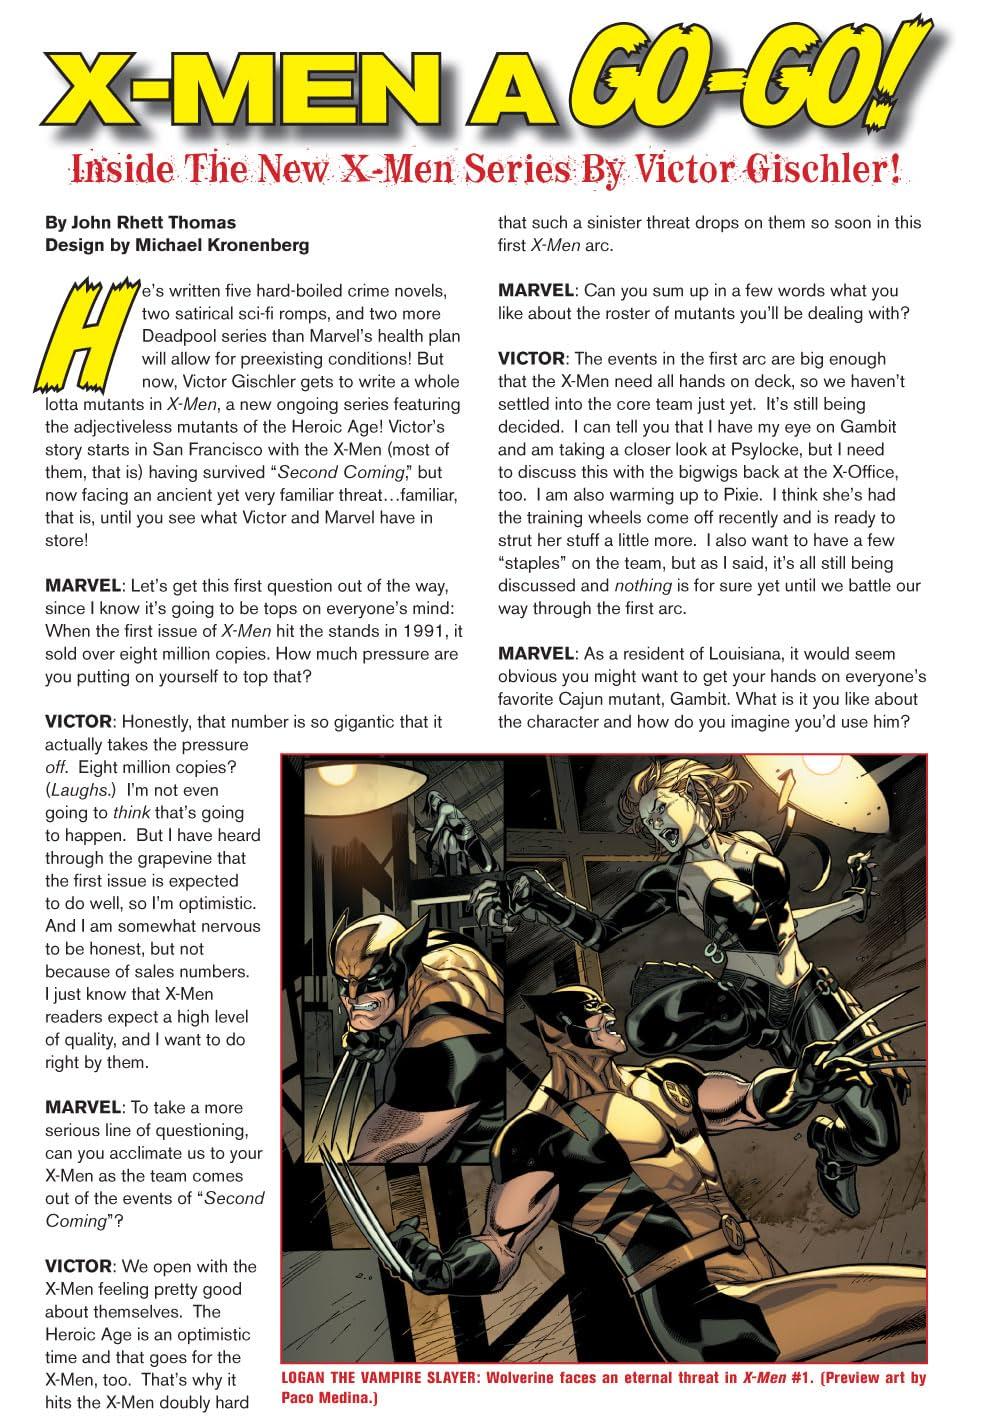 X-Men: Curse of the Mutants Saga